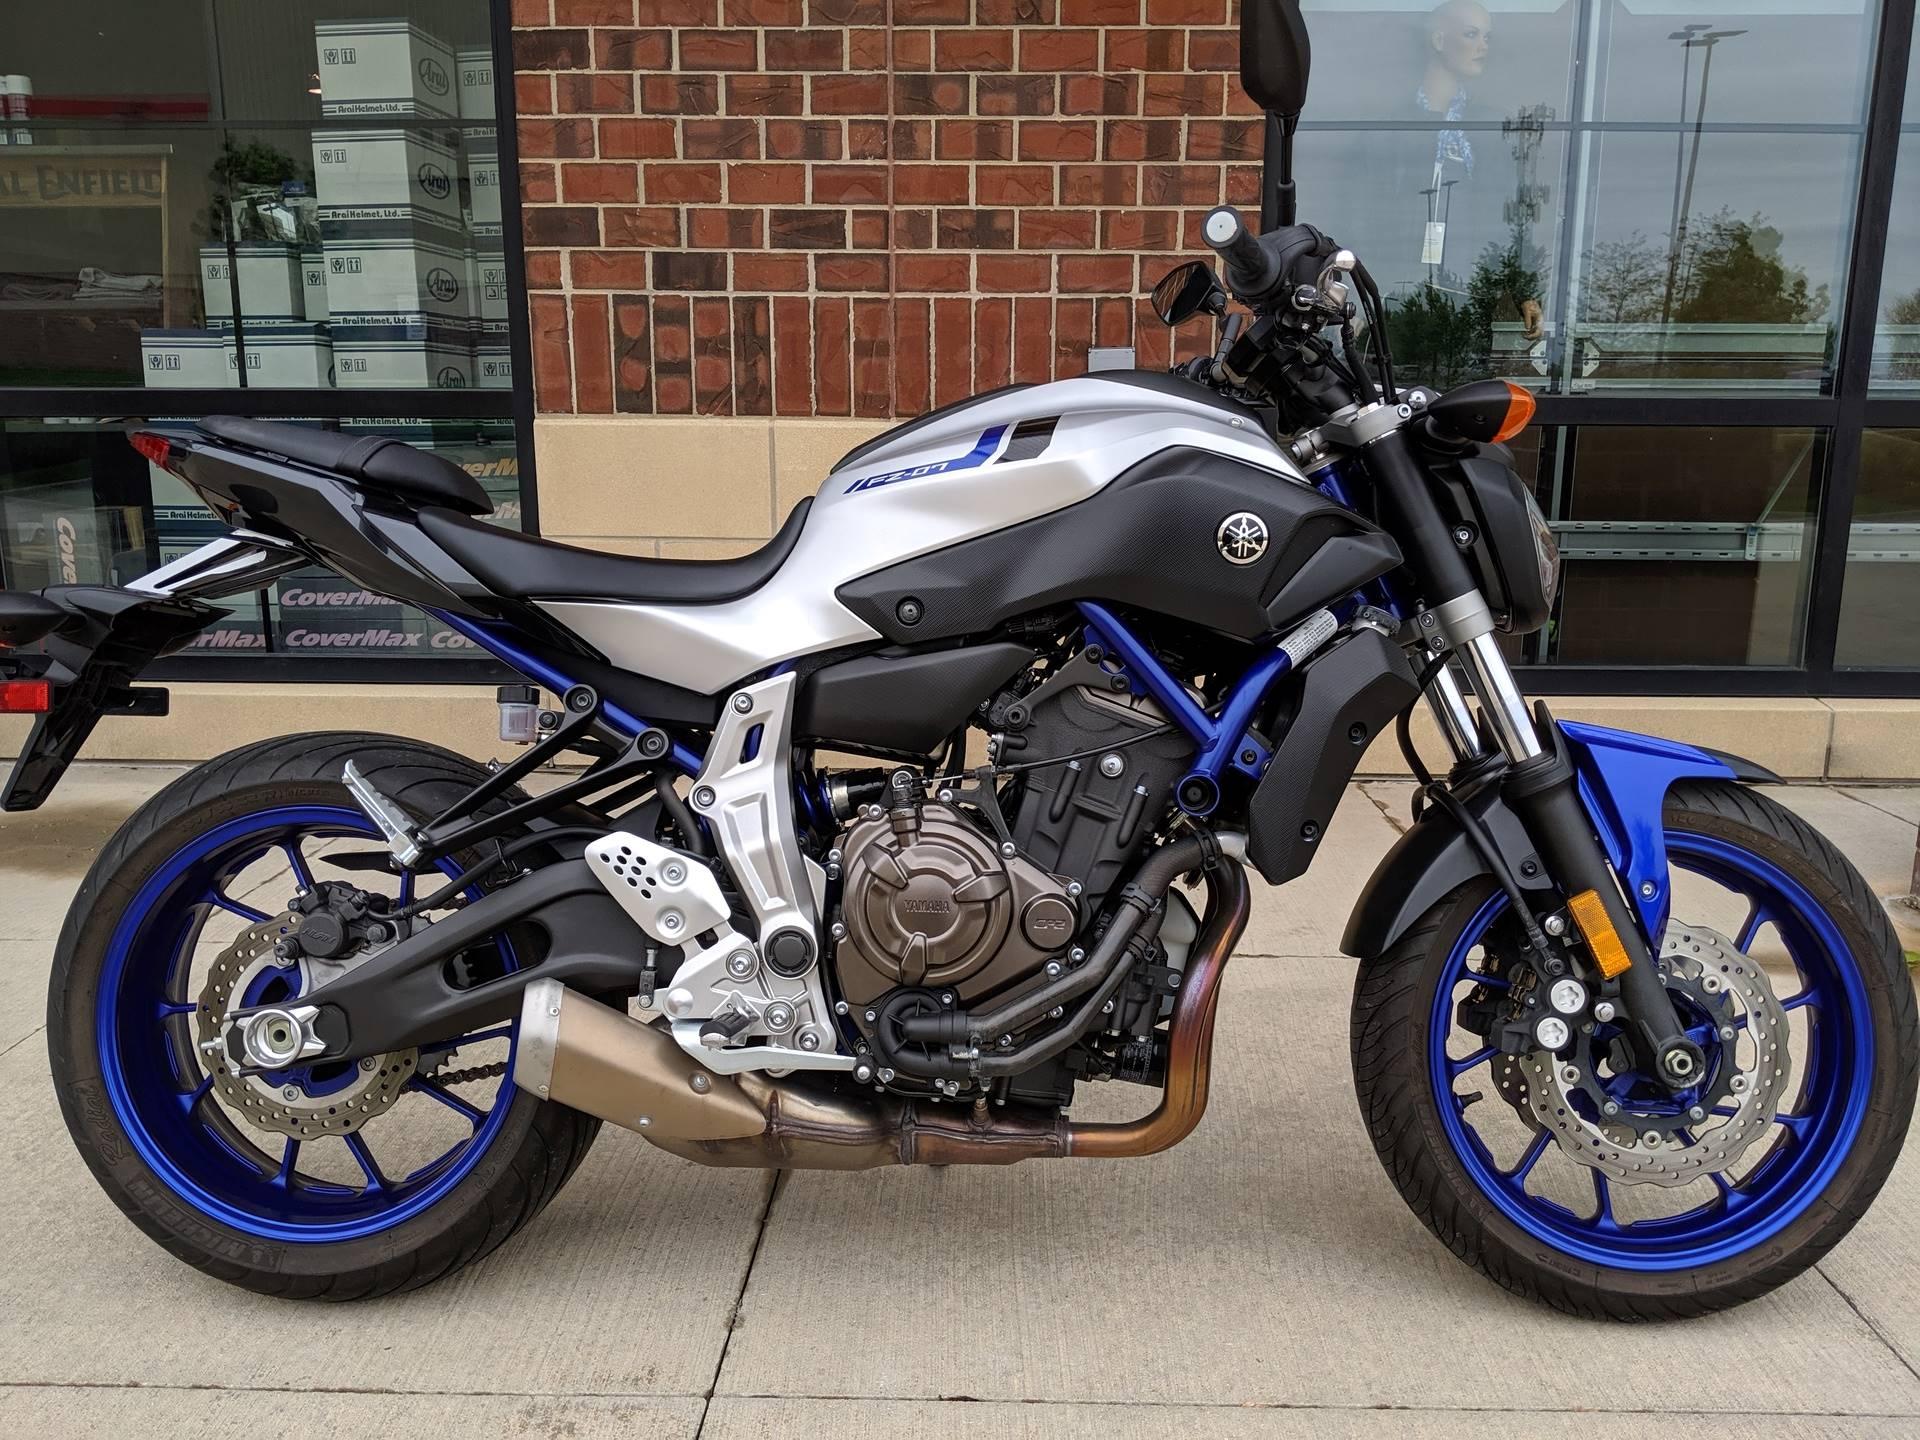 2016 Yamaha FZ-07 for sale 127620